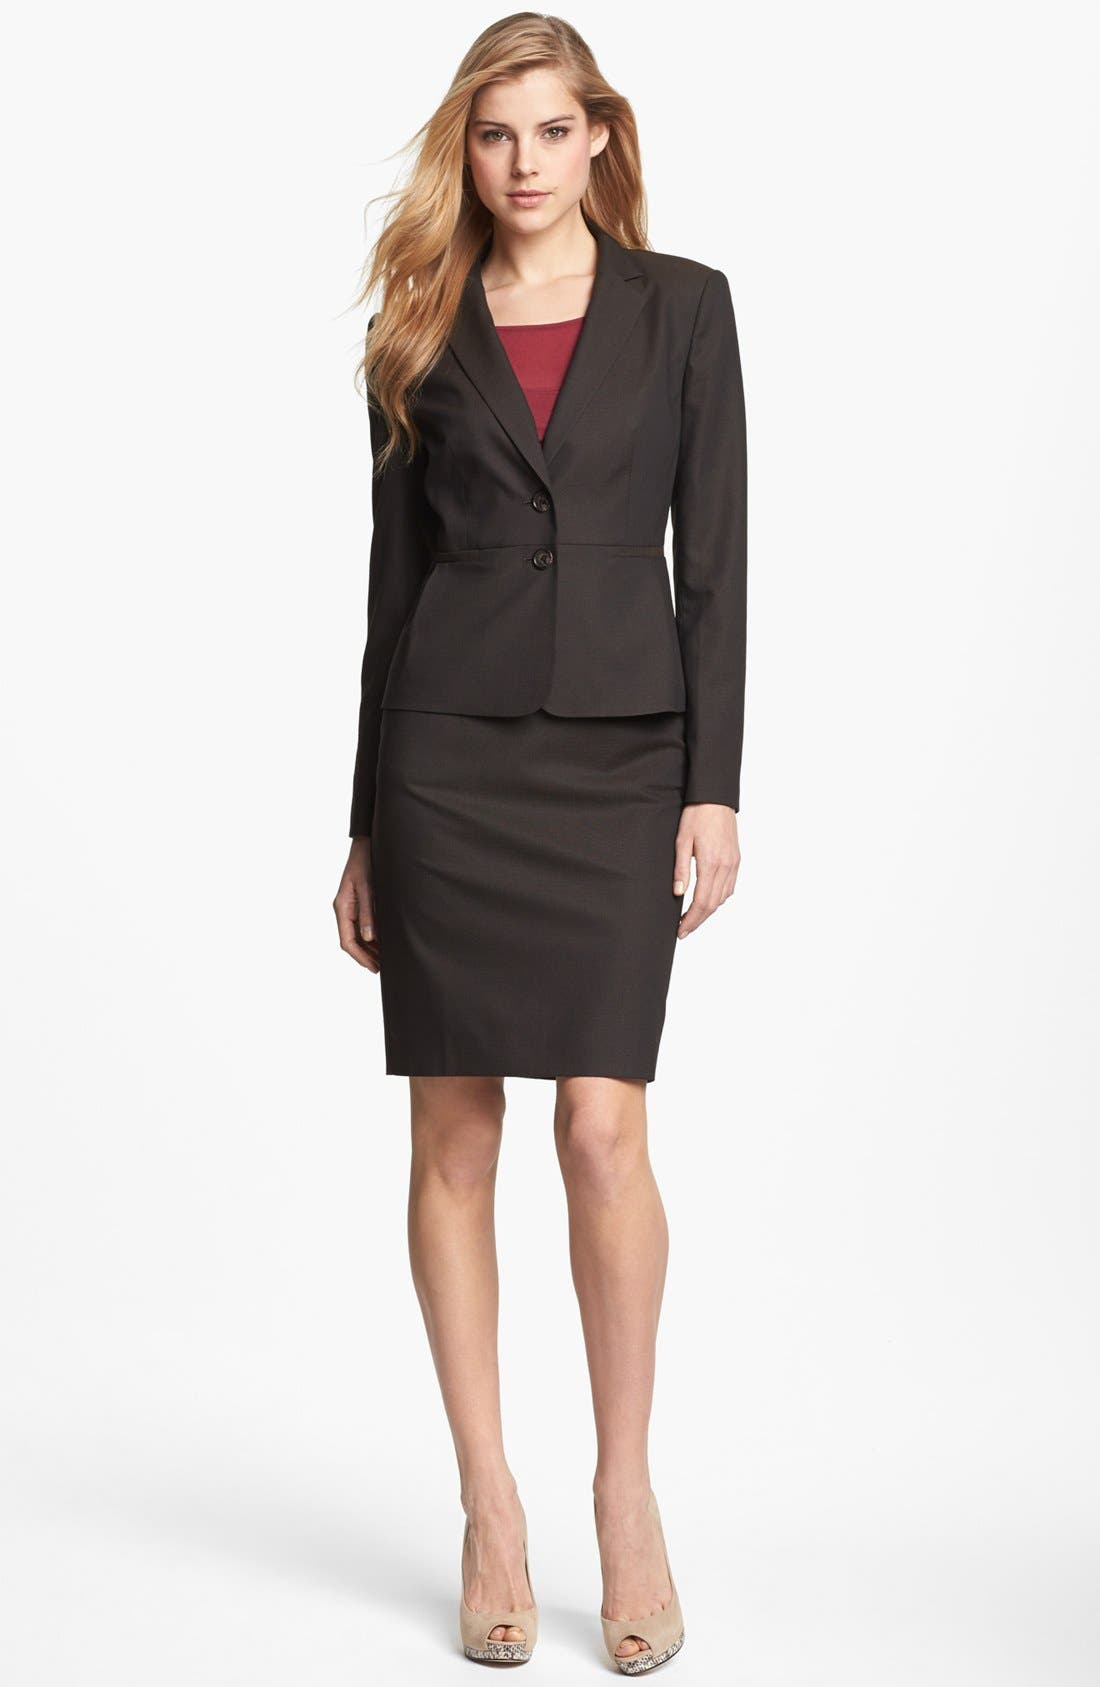 Main Image - Halogen® Suit Jacket, Top & Pencil Skirt